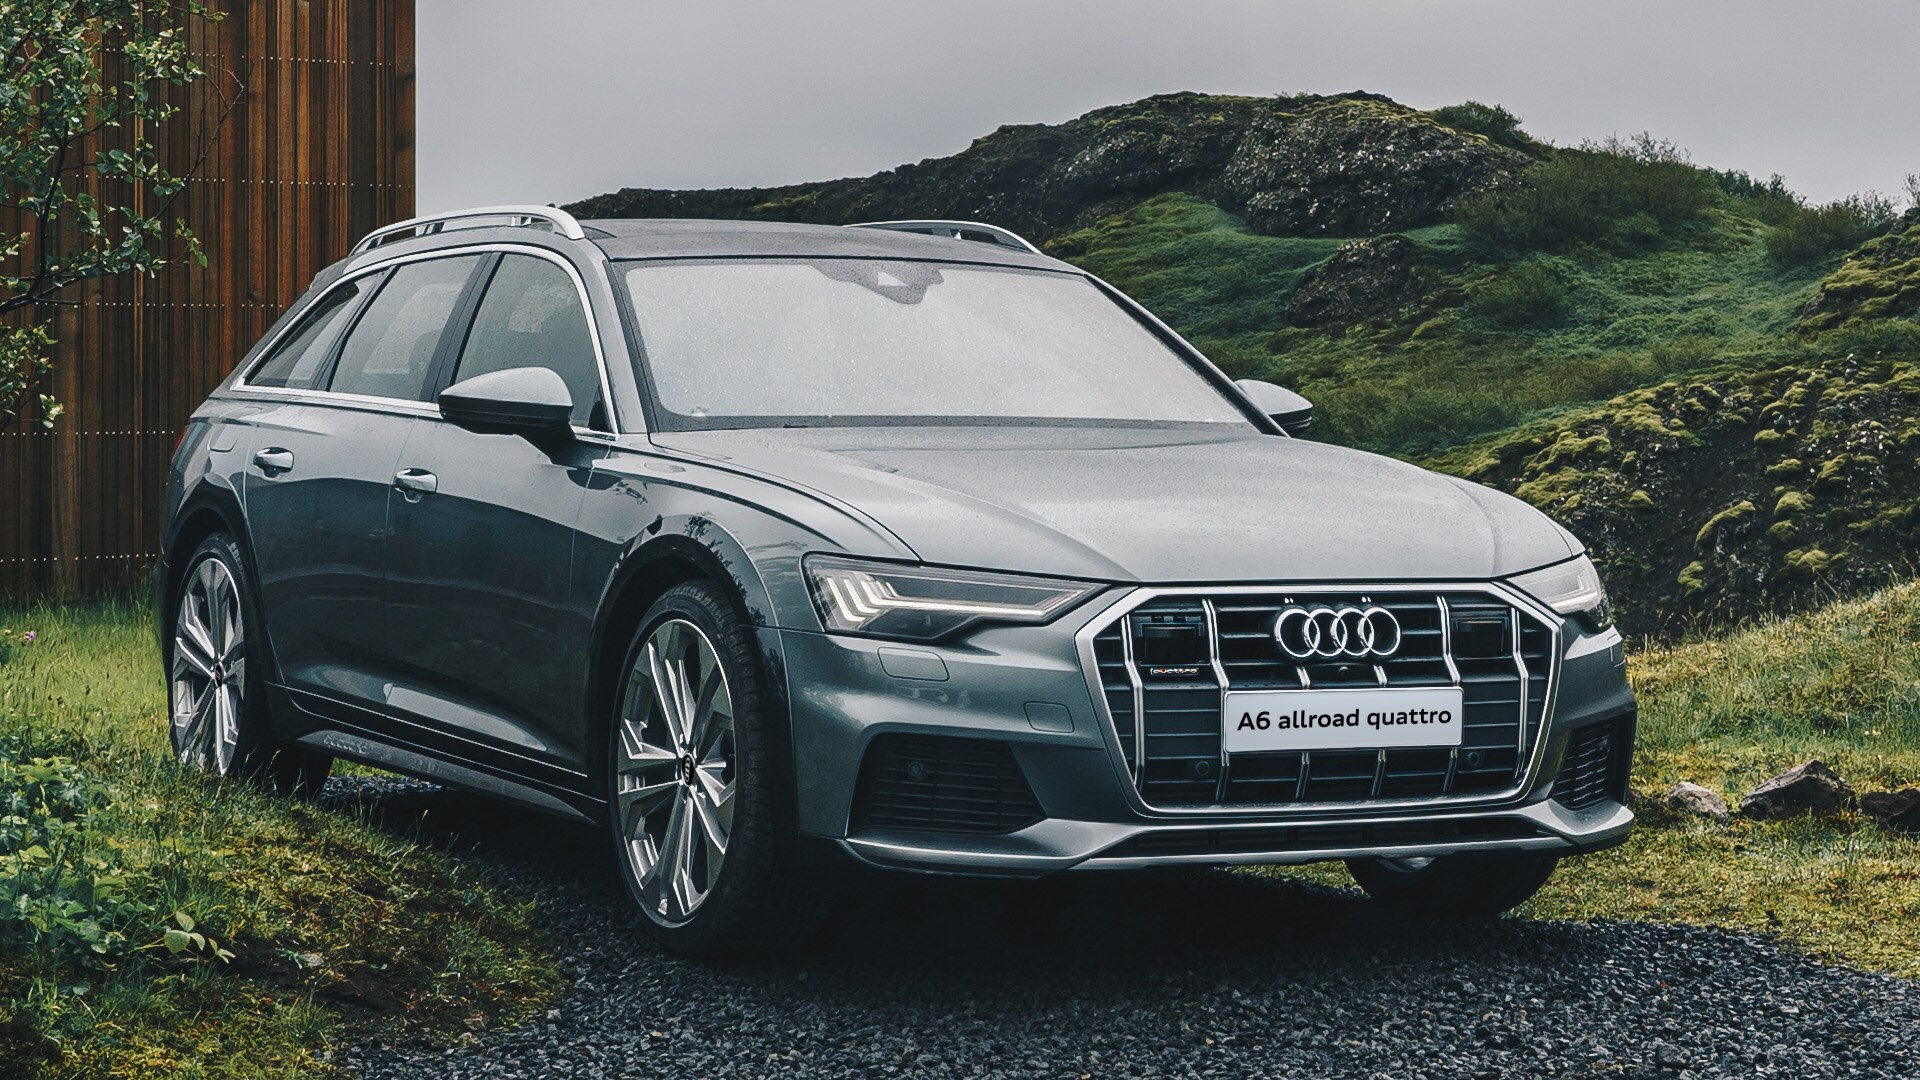 Audi A6 allroad quattro 2019 (вид сбоку и спереди)